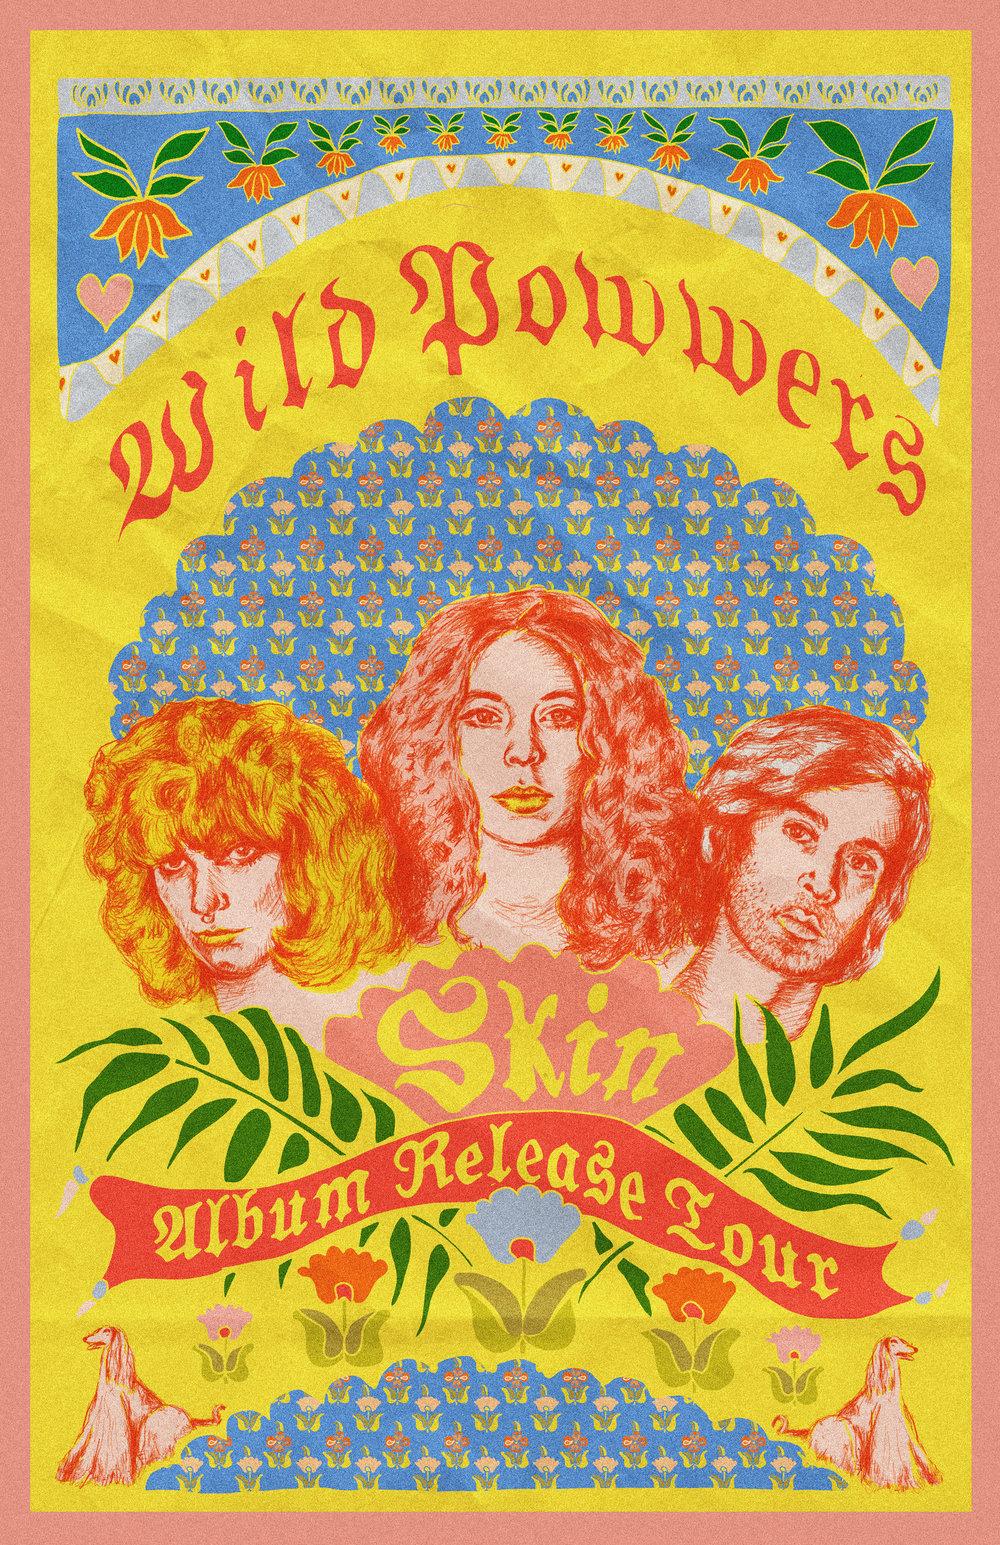 Wild Powers Album Release.jpg